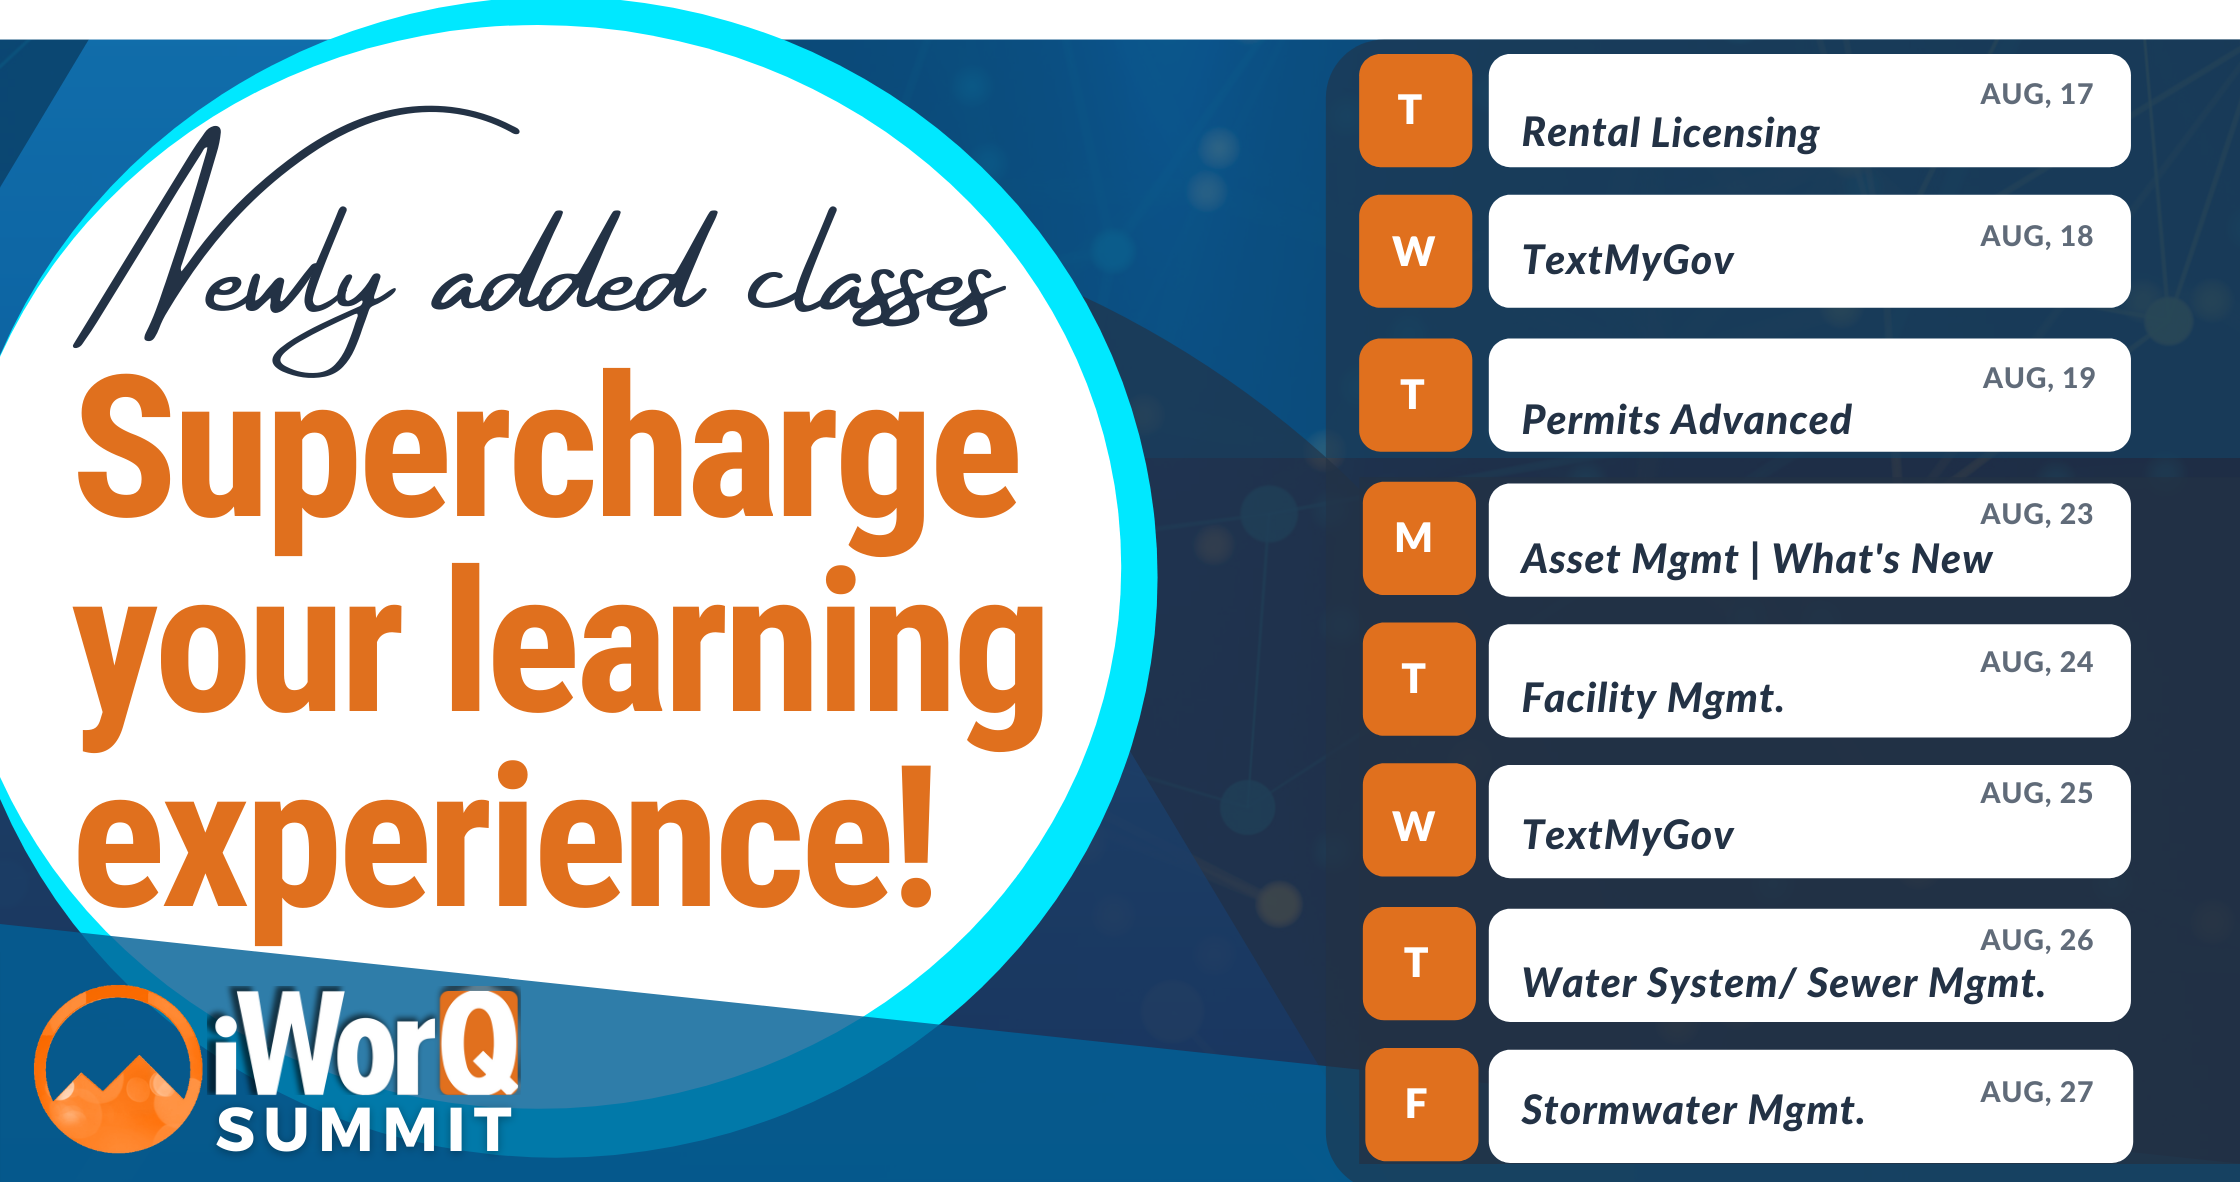 summit classes added